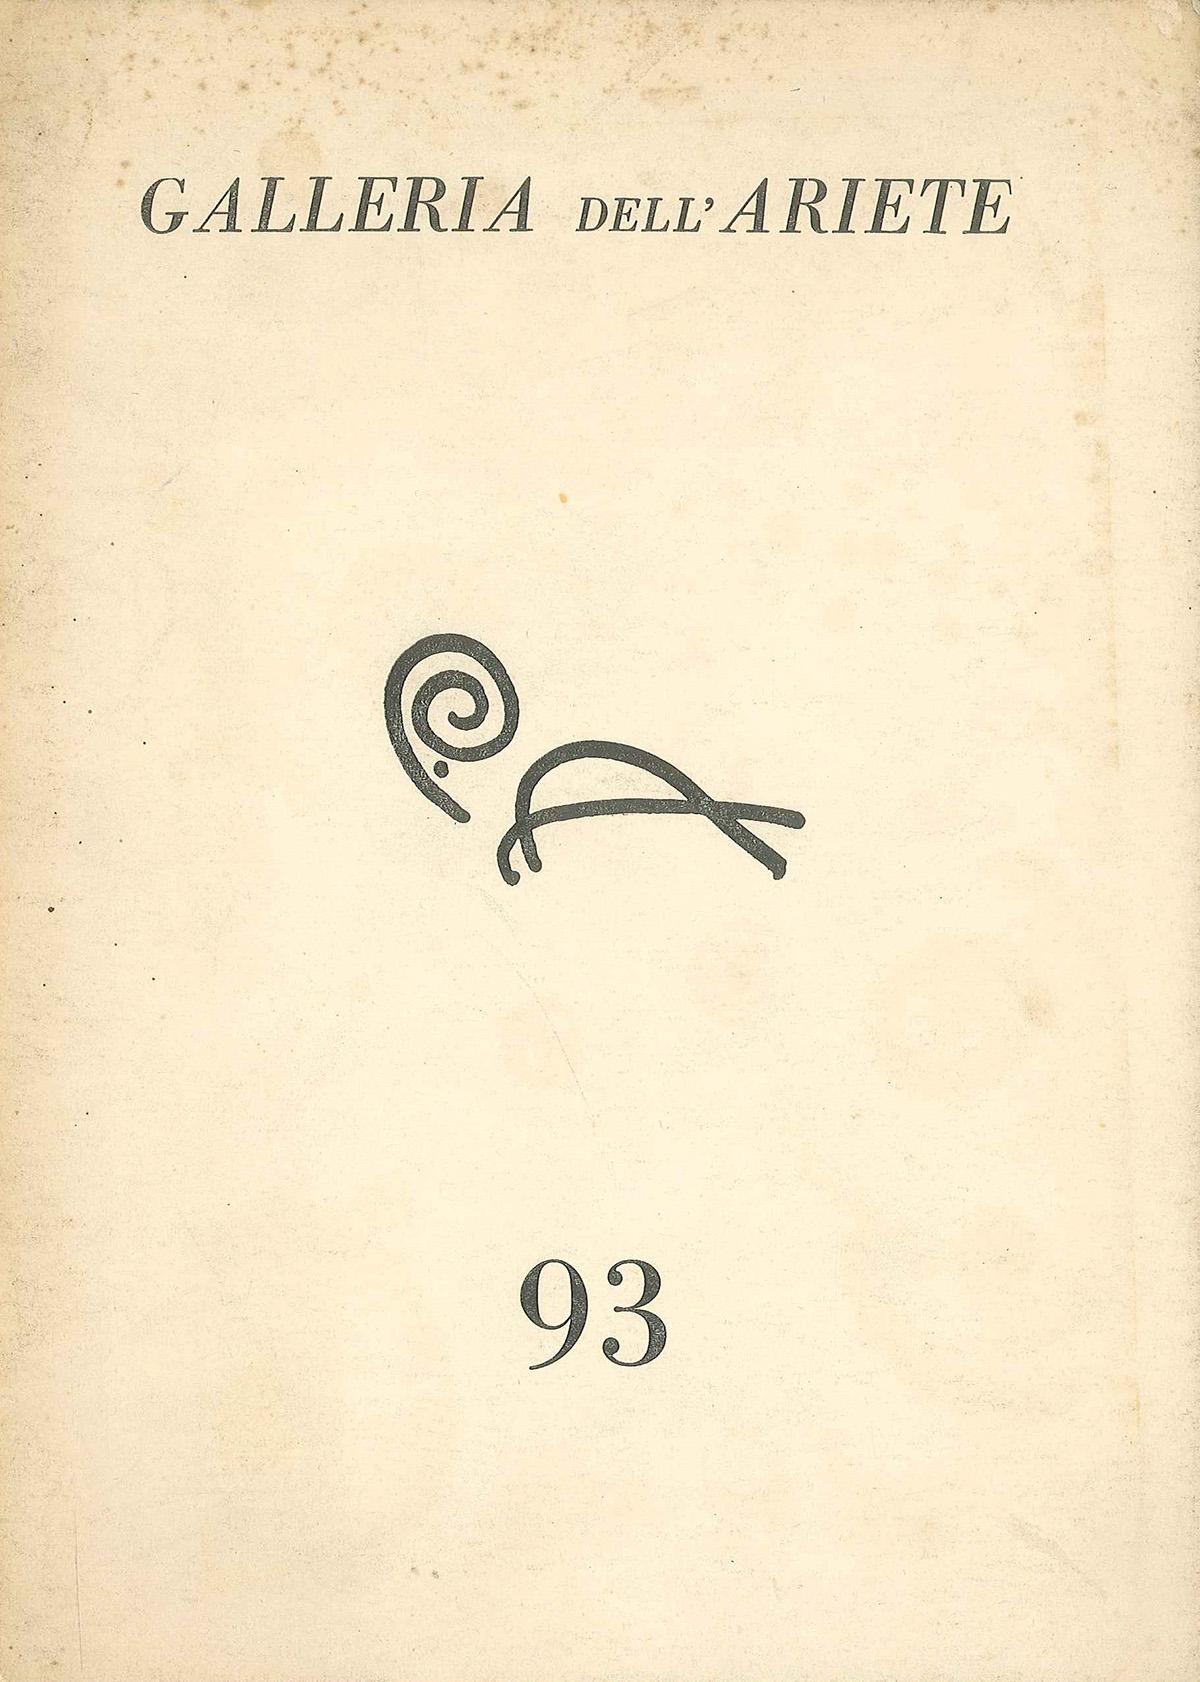 1 - 1963